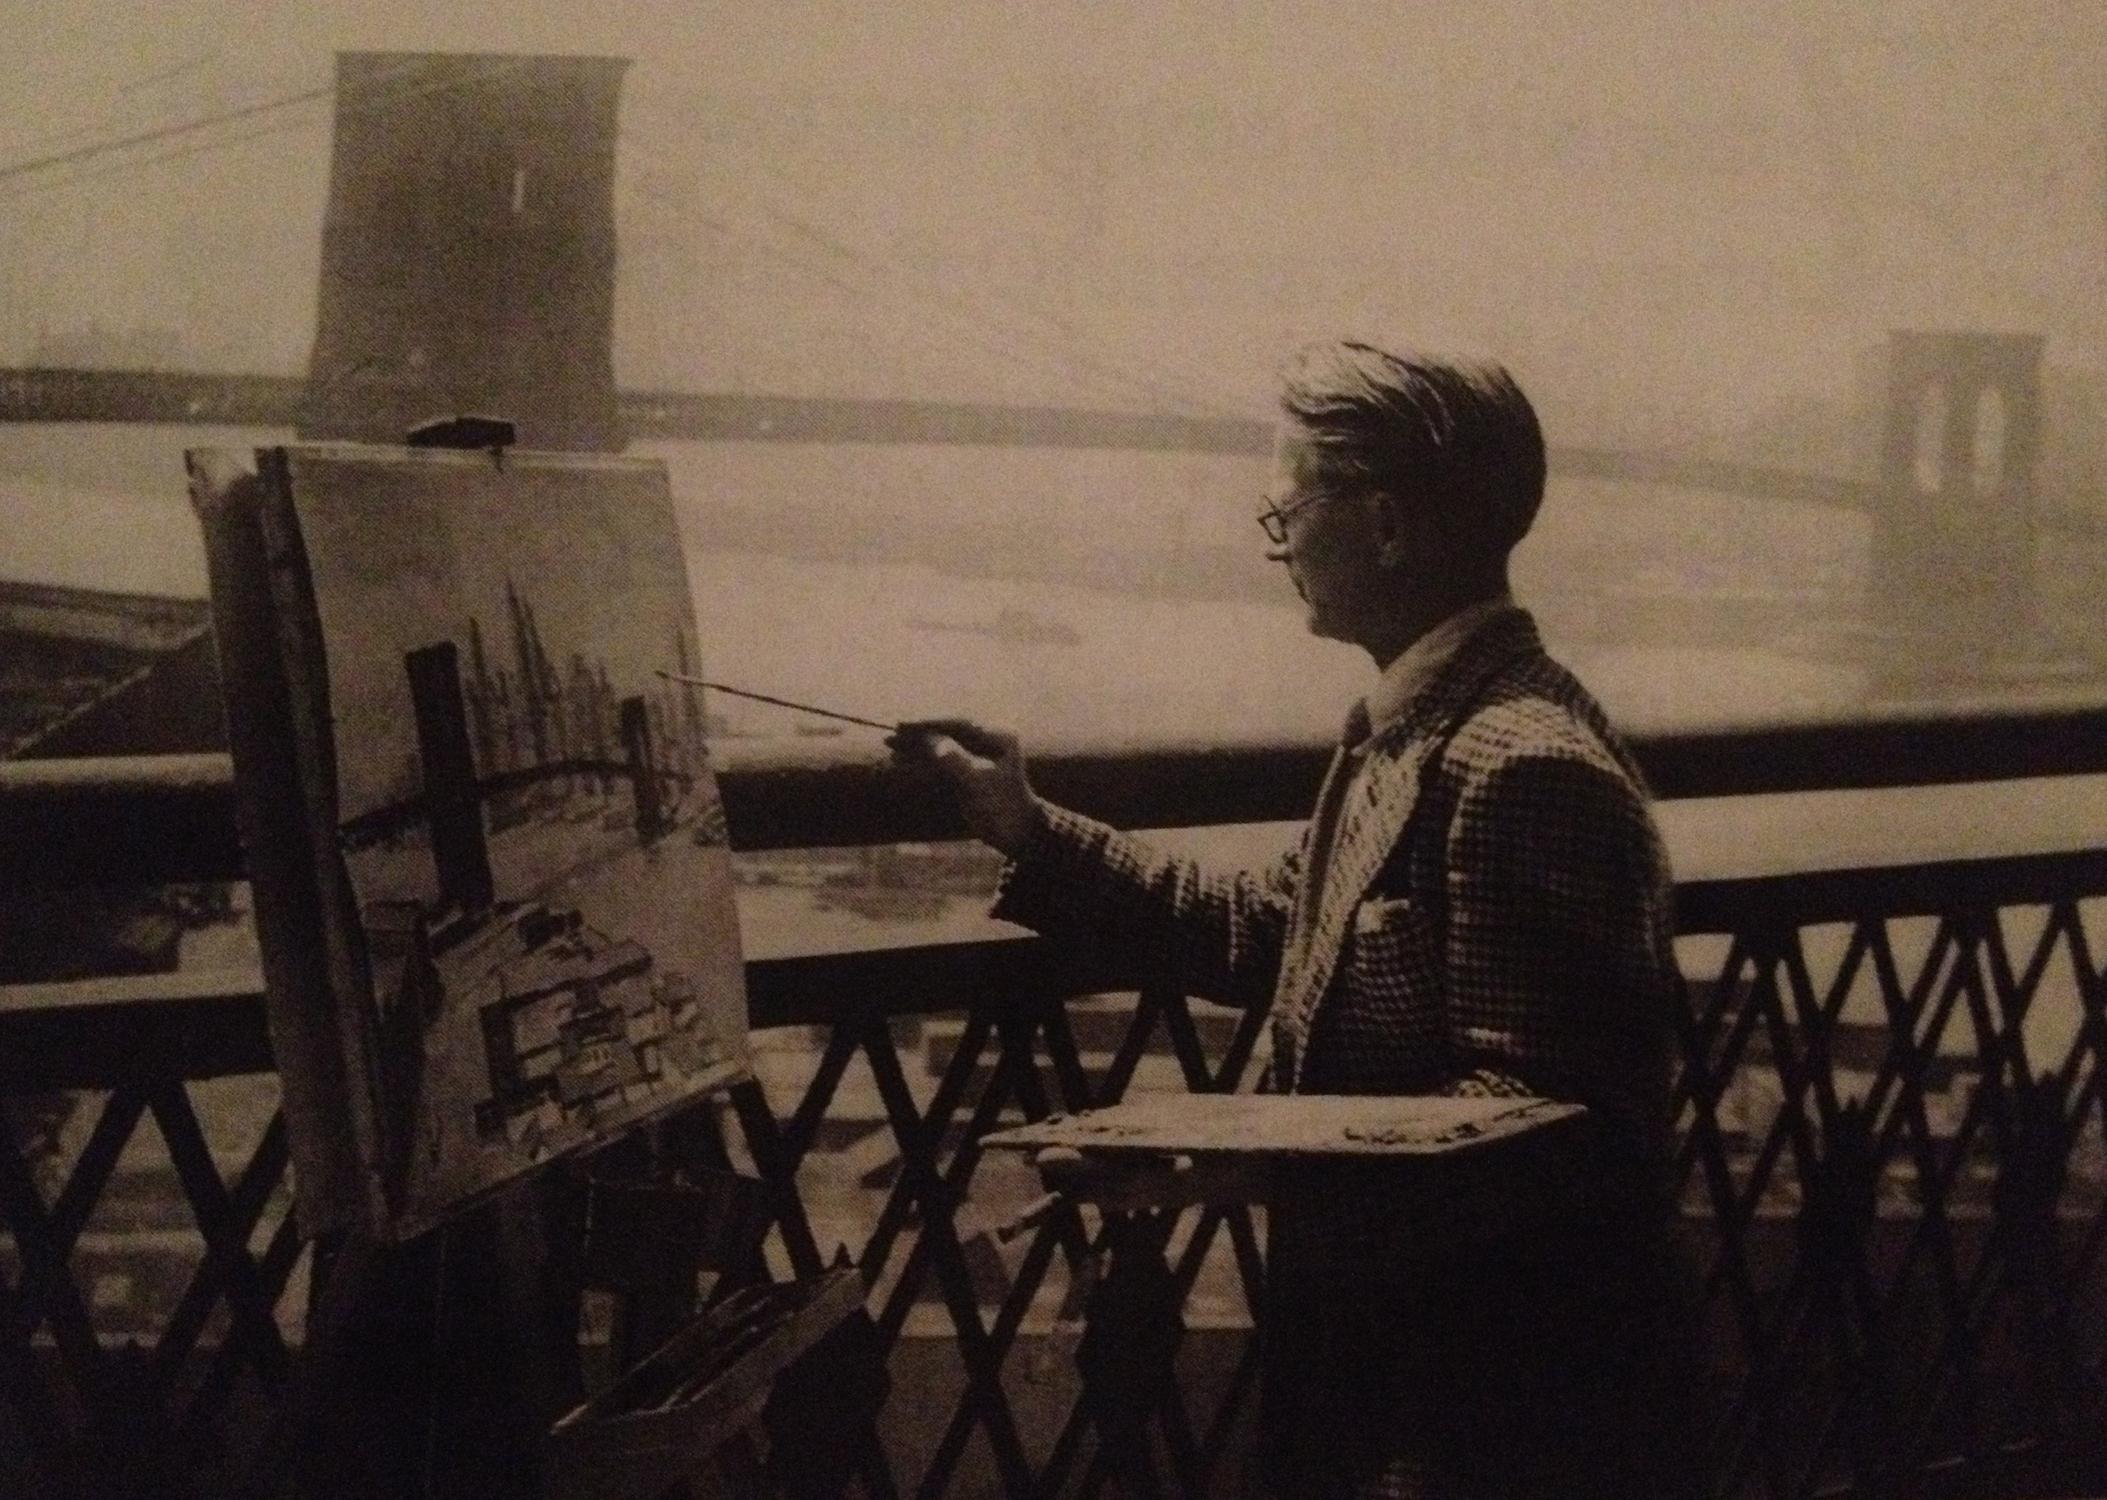 Benny in New York painting Brooklyn Bridge (1949)